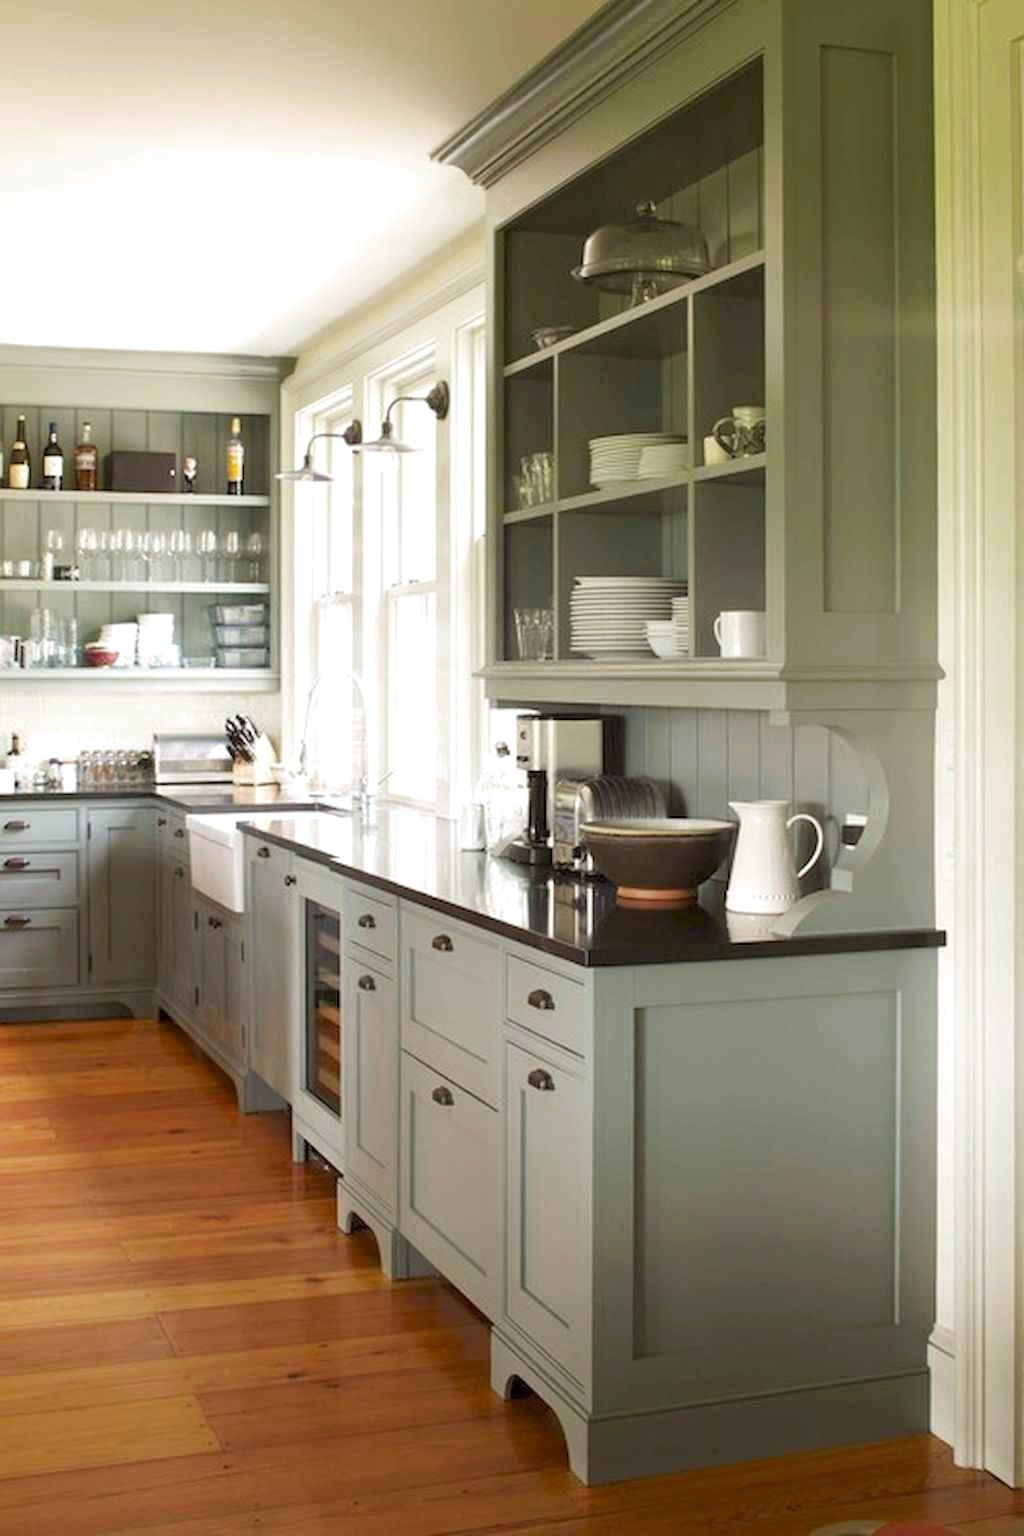 ✔77 Favourite Farmhouse Kitchen Cabinet Design Ideas #Farmhouse #KitchenCabinet #farmhousekitchencolors